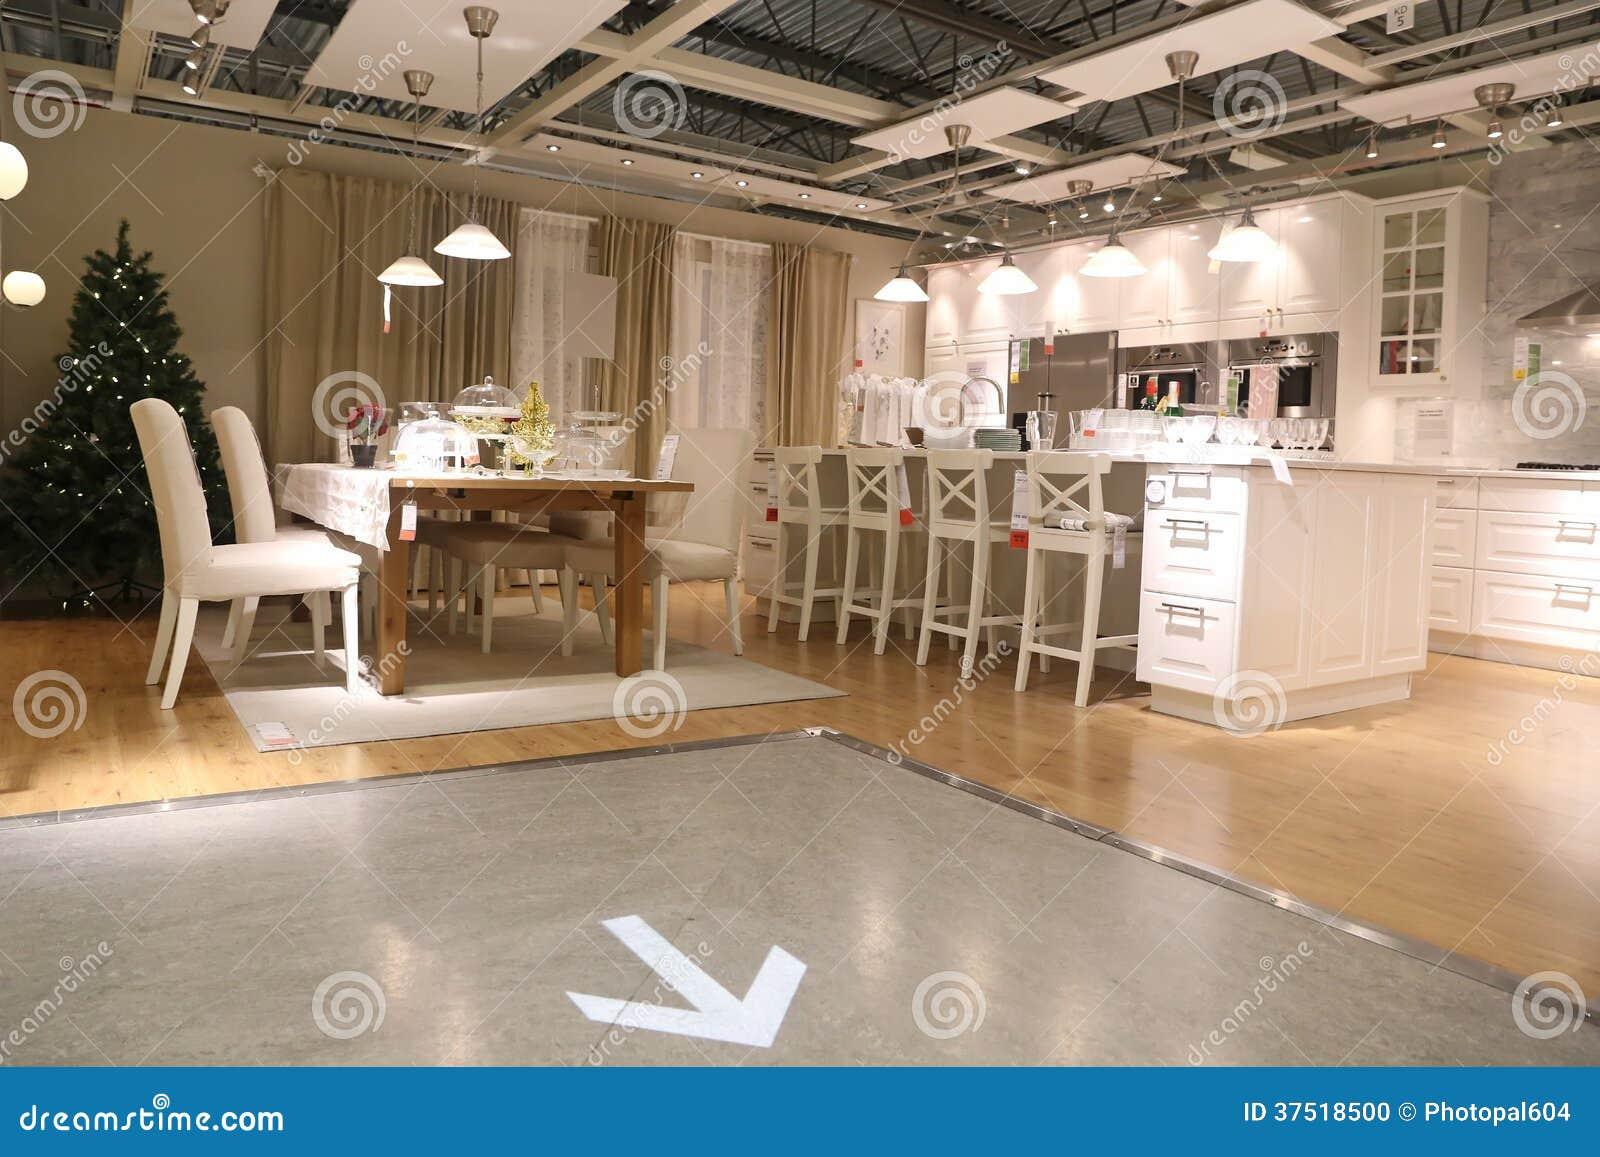 montrez la pi ce l 39 int rieur du magasin d 39 ikea image ditorial image 37518500. Black Bedroom Furniture Sets. Home Design Ideas